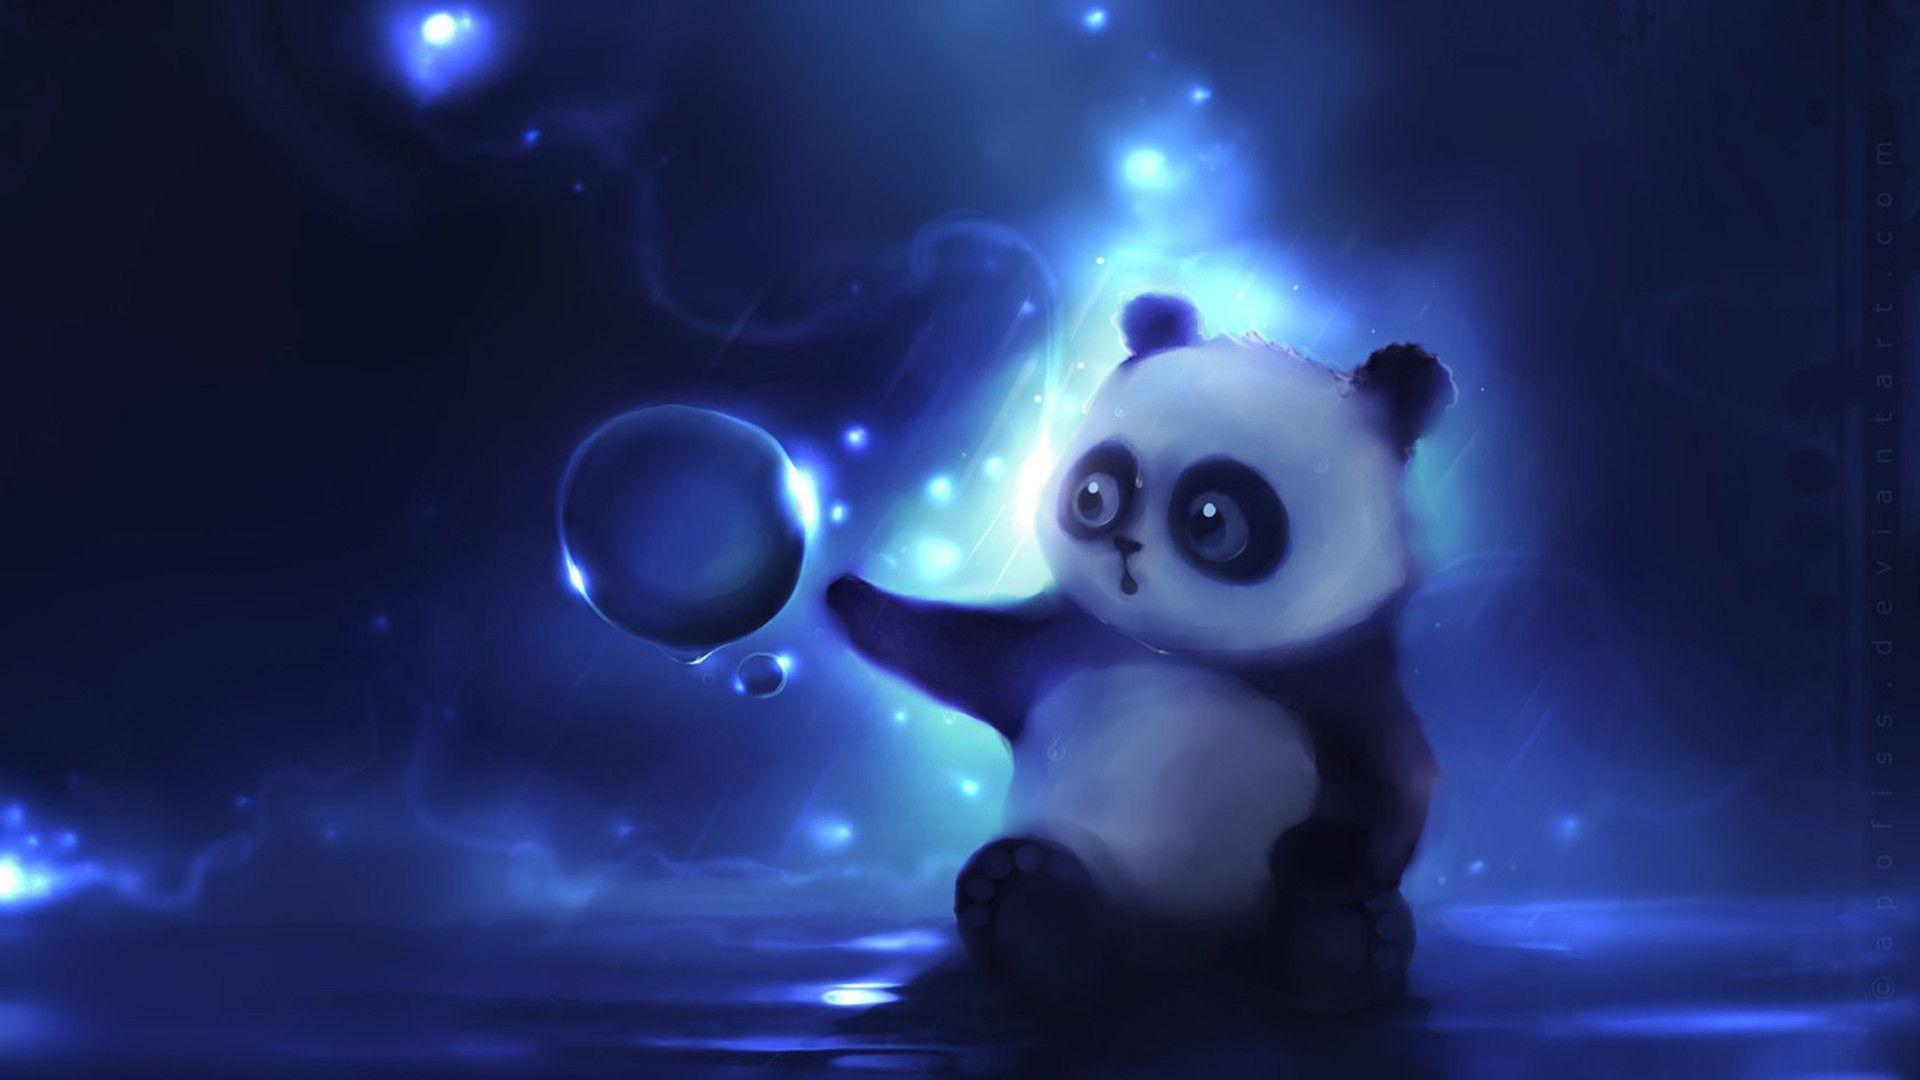 Download Panda Bears Wallpaper 1920x1080 | Wallpoper #328116